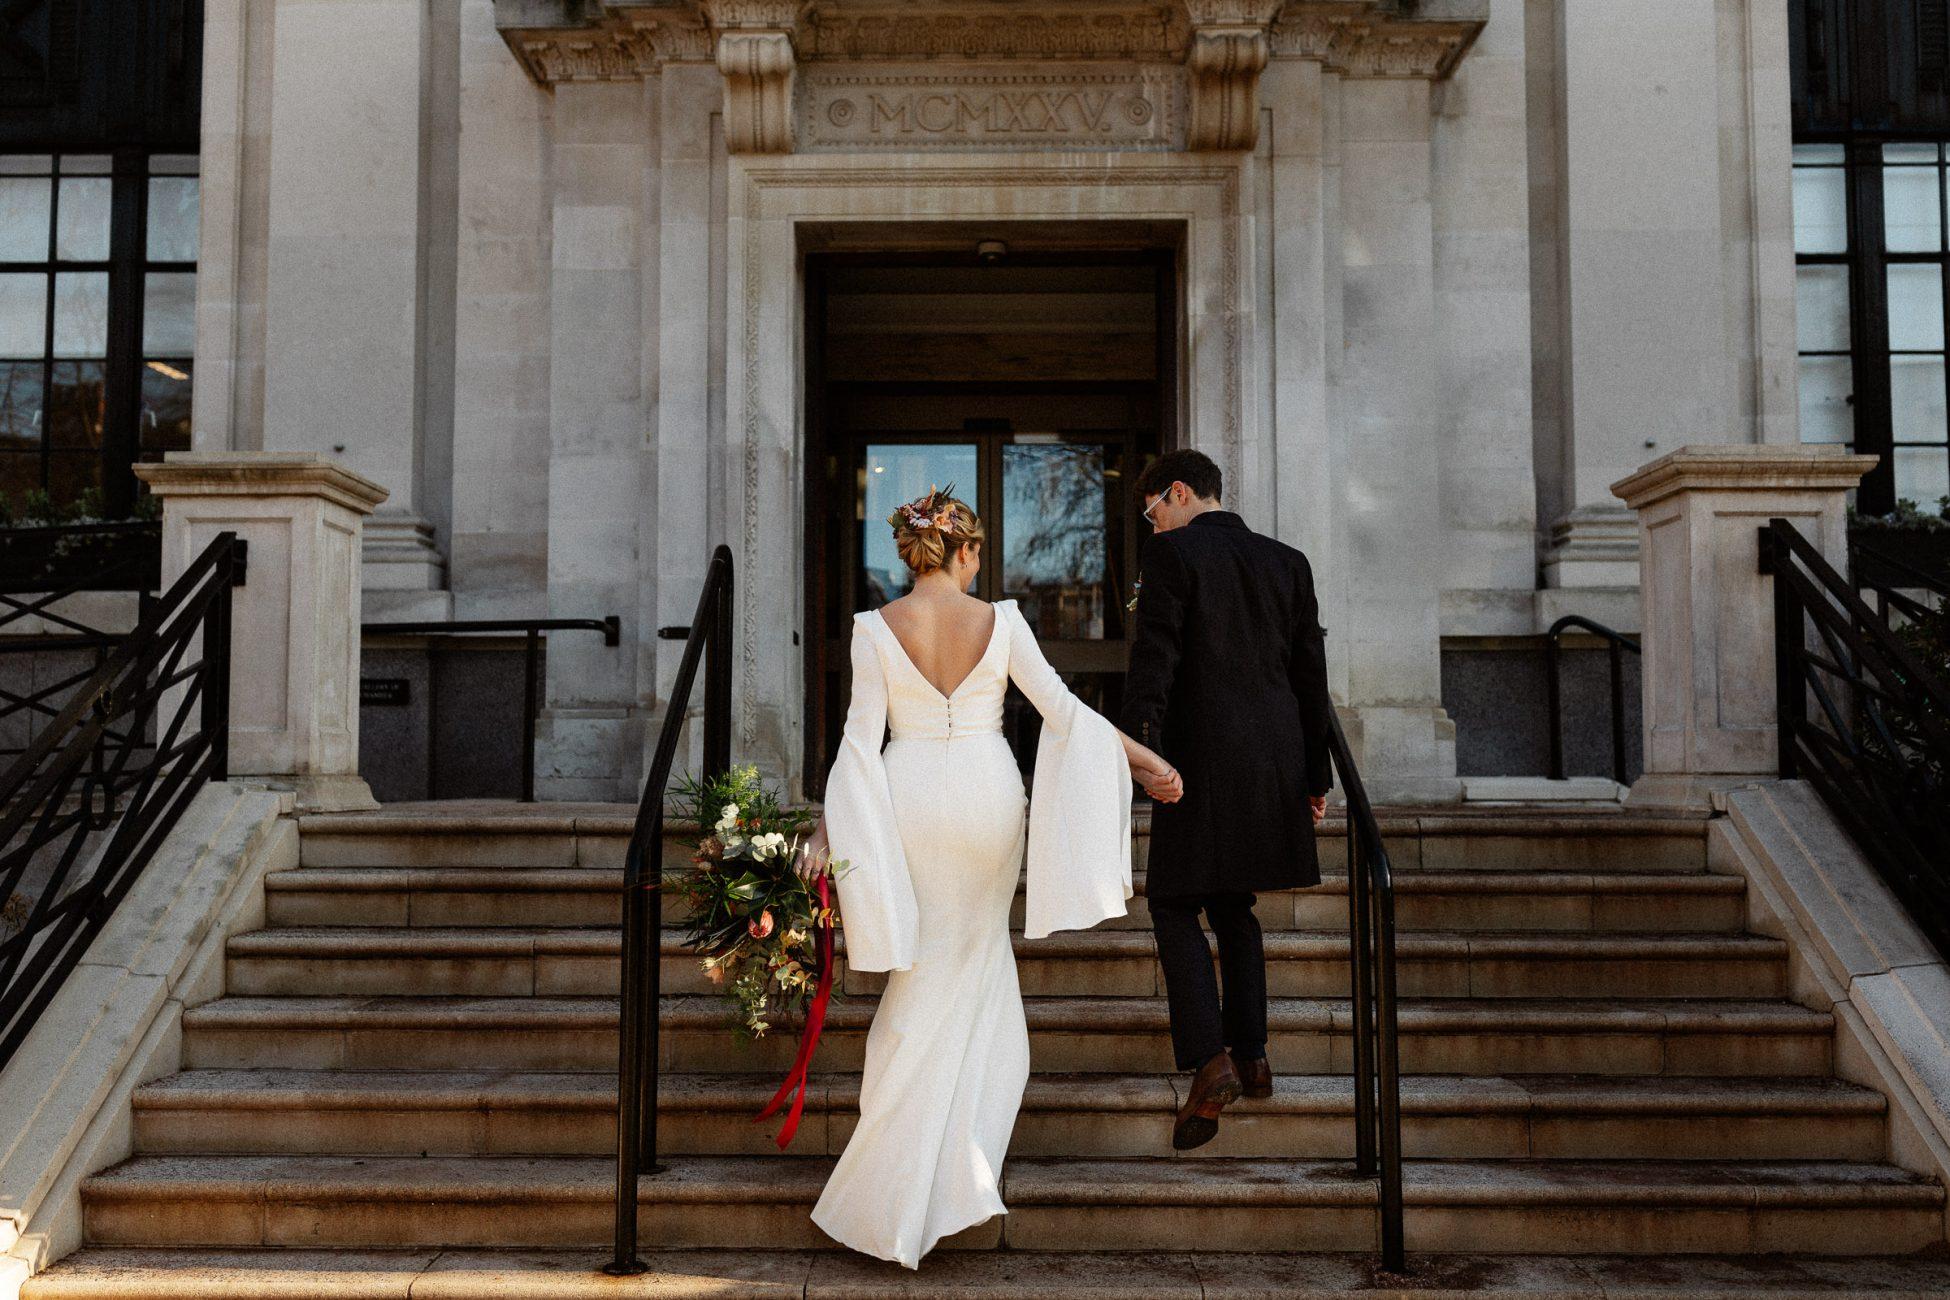 London Wedding Photographer - Islington Town Hall Wedding